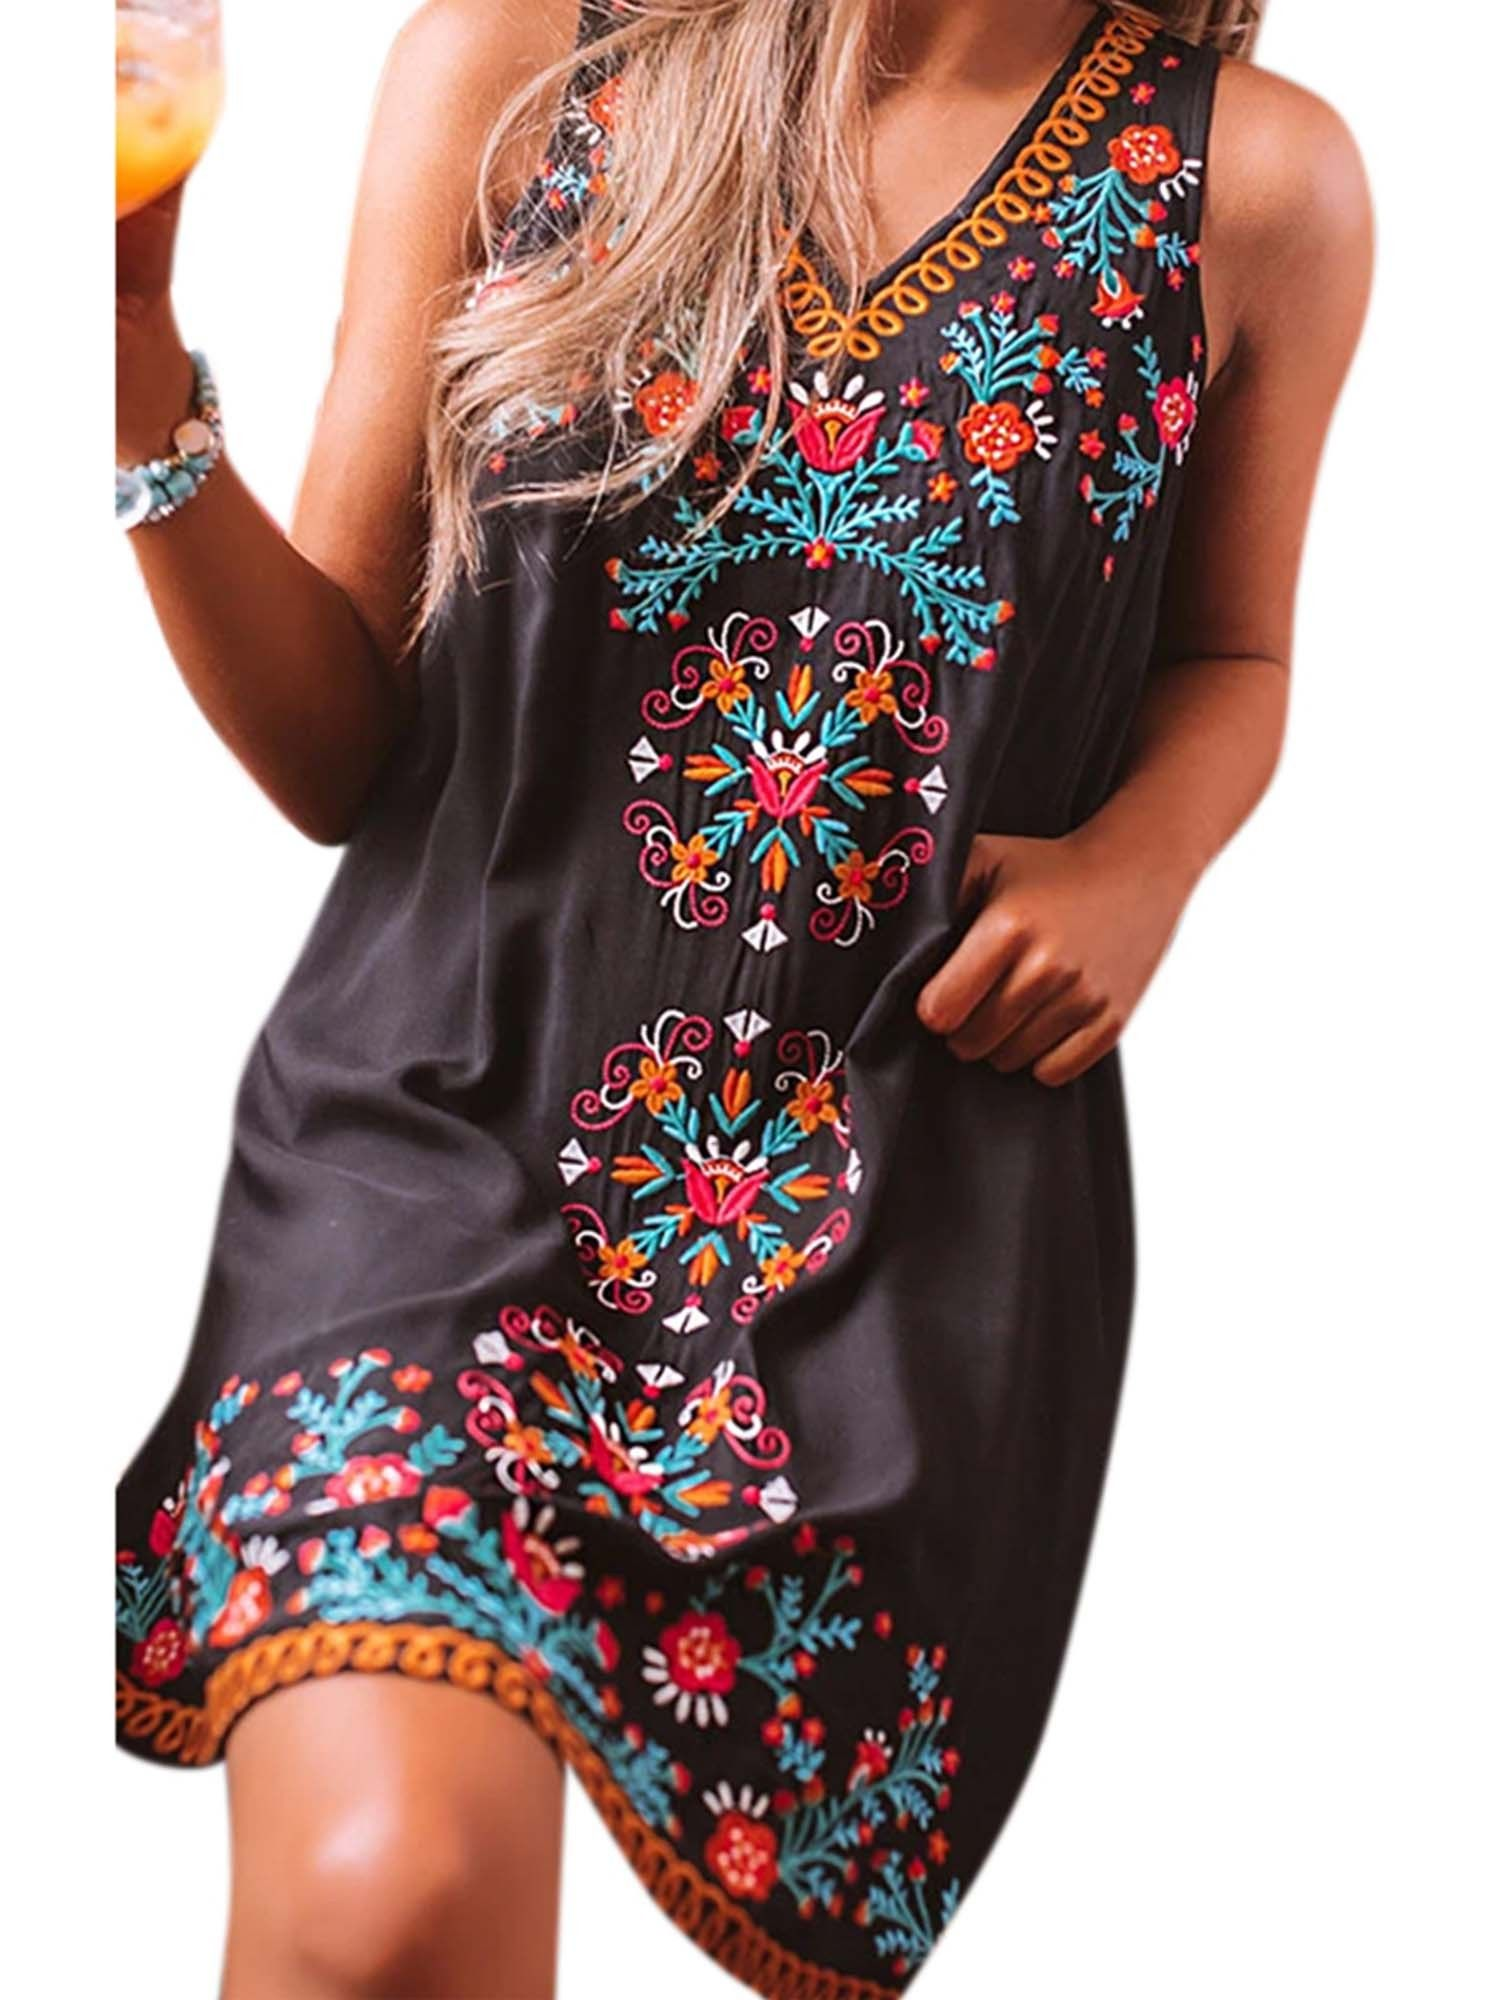 Wodstyle Women S Summer Boho Mini Dress Casual Loose Sleeveless V Neck Floral Sundress Walmart Com Mini Dress Casual Boho Mini Dress Essential Dress [ 2000 x 1500 Pixel ]